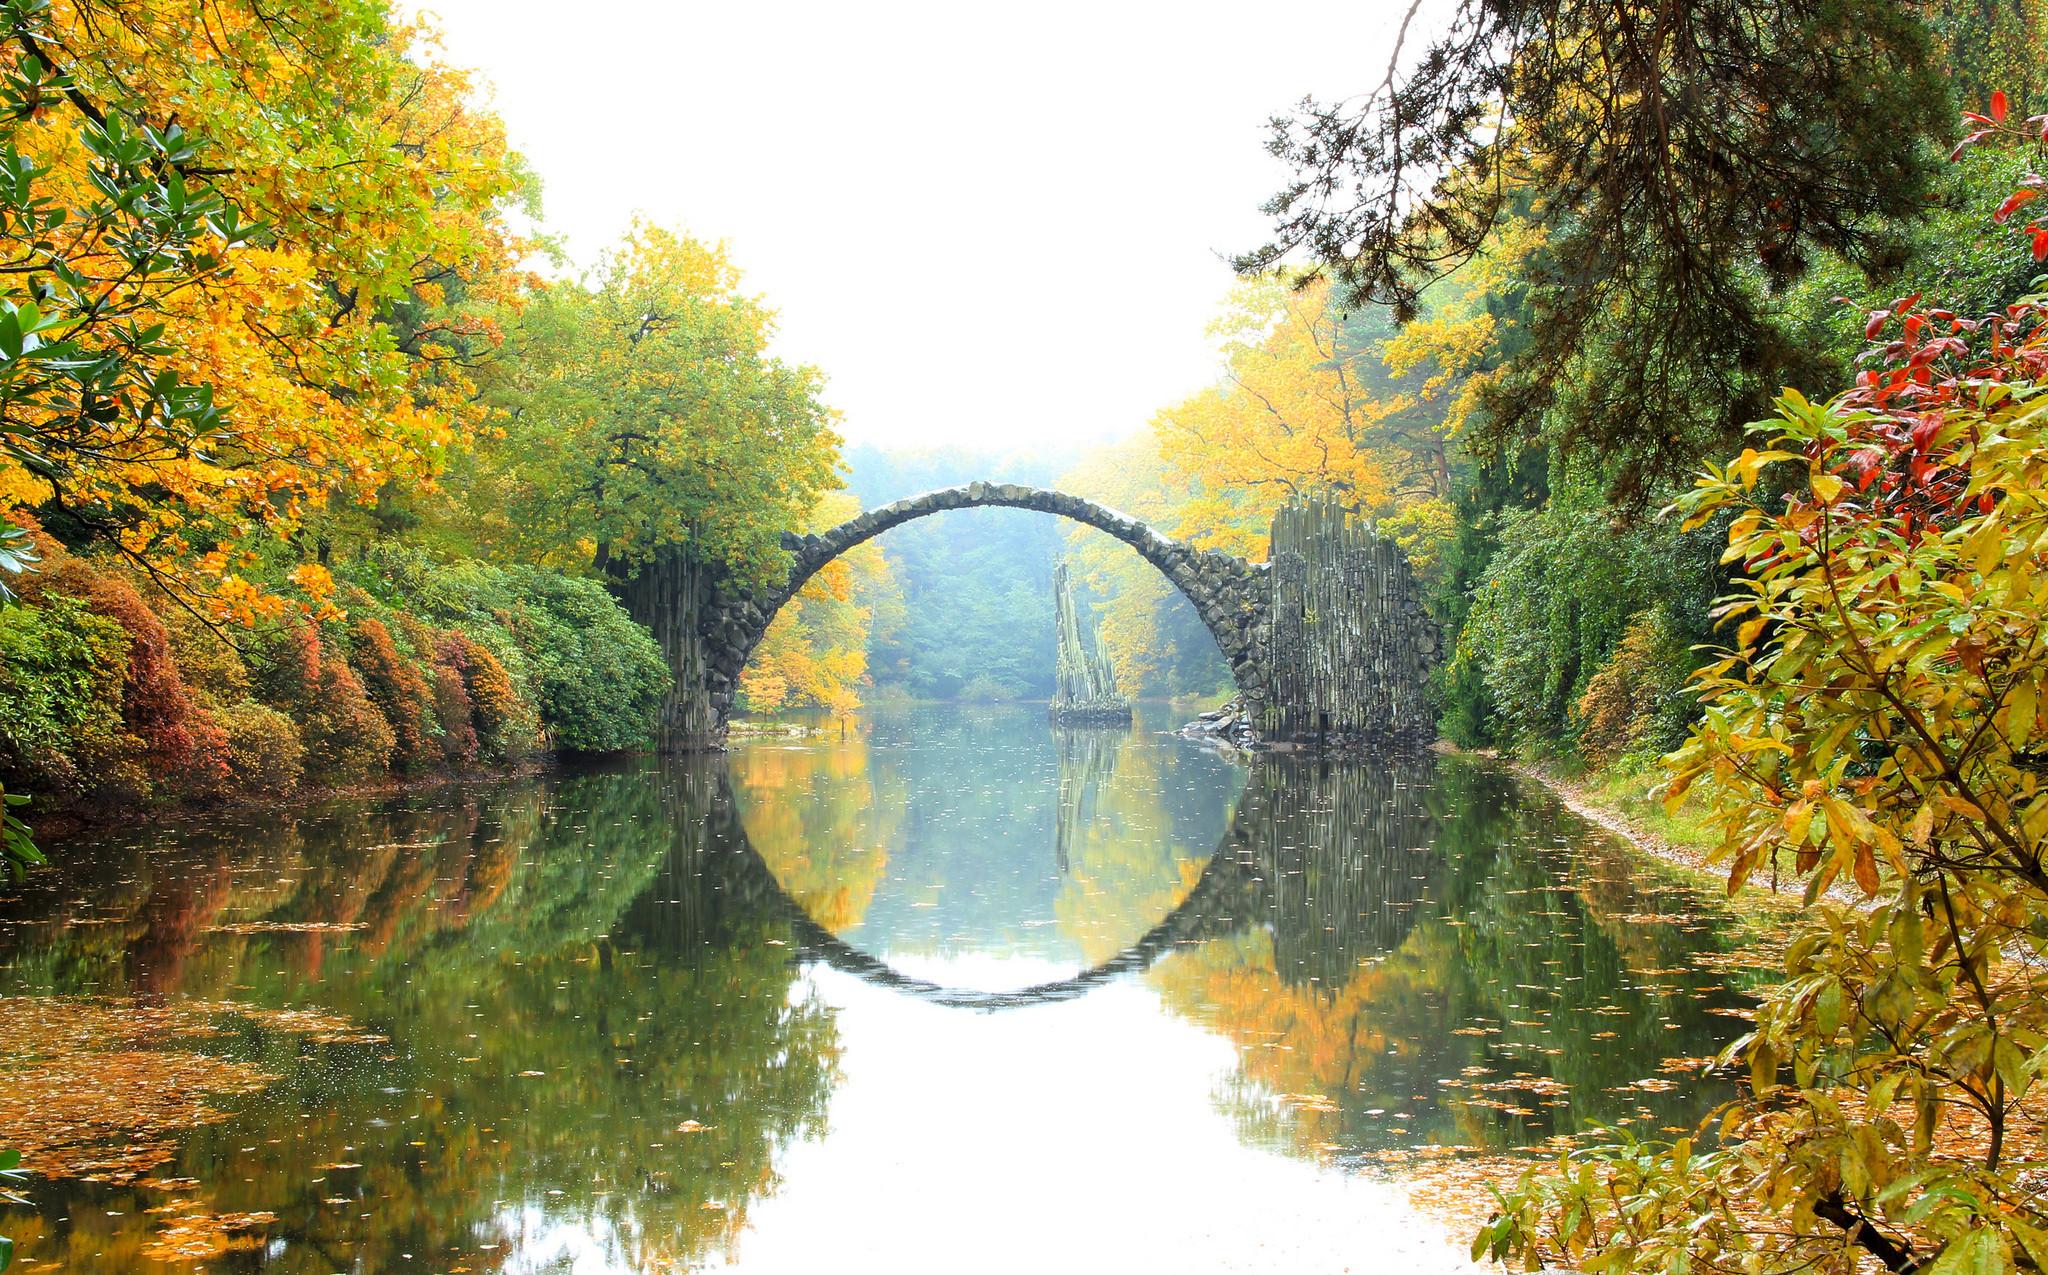 обои Rhododendronpark Kromlau, Germany, Германия, осень картинки фото